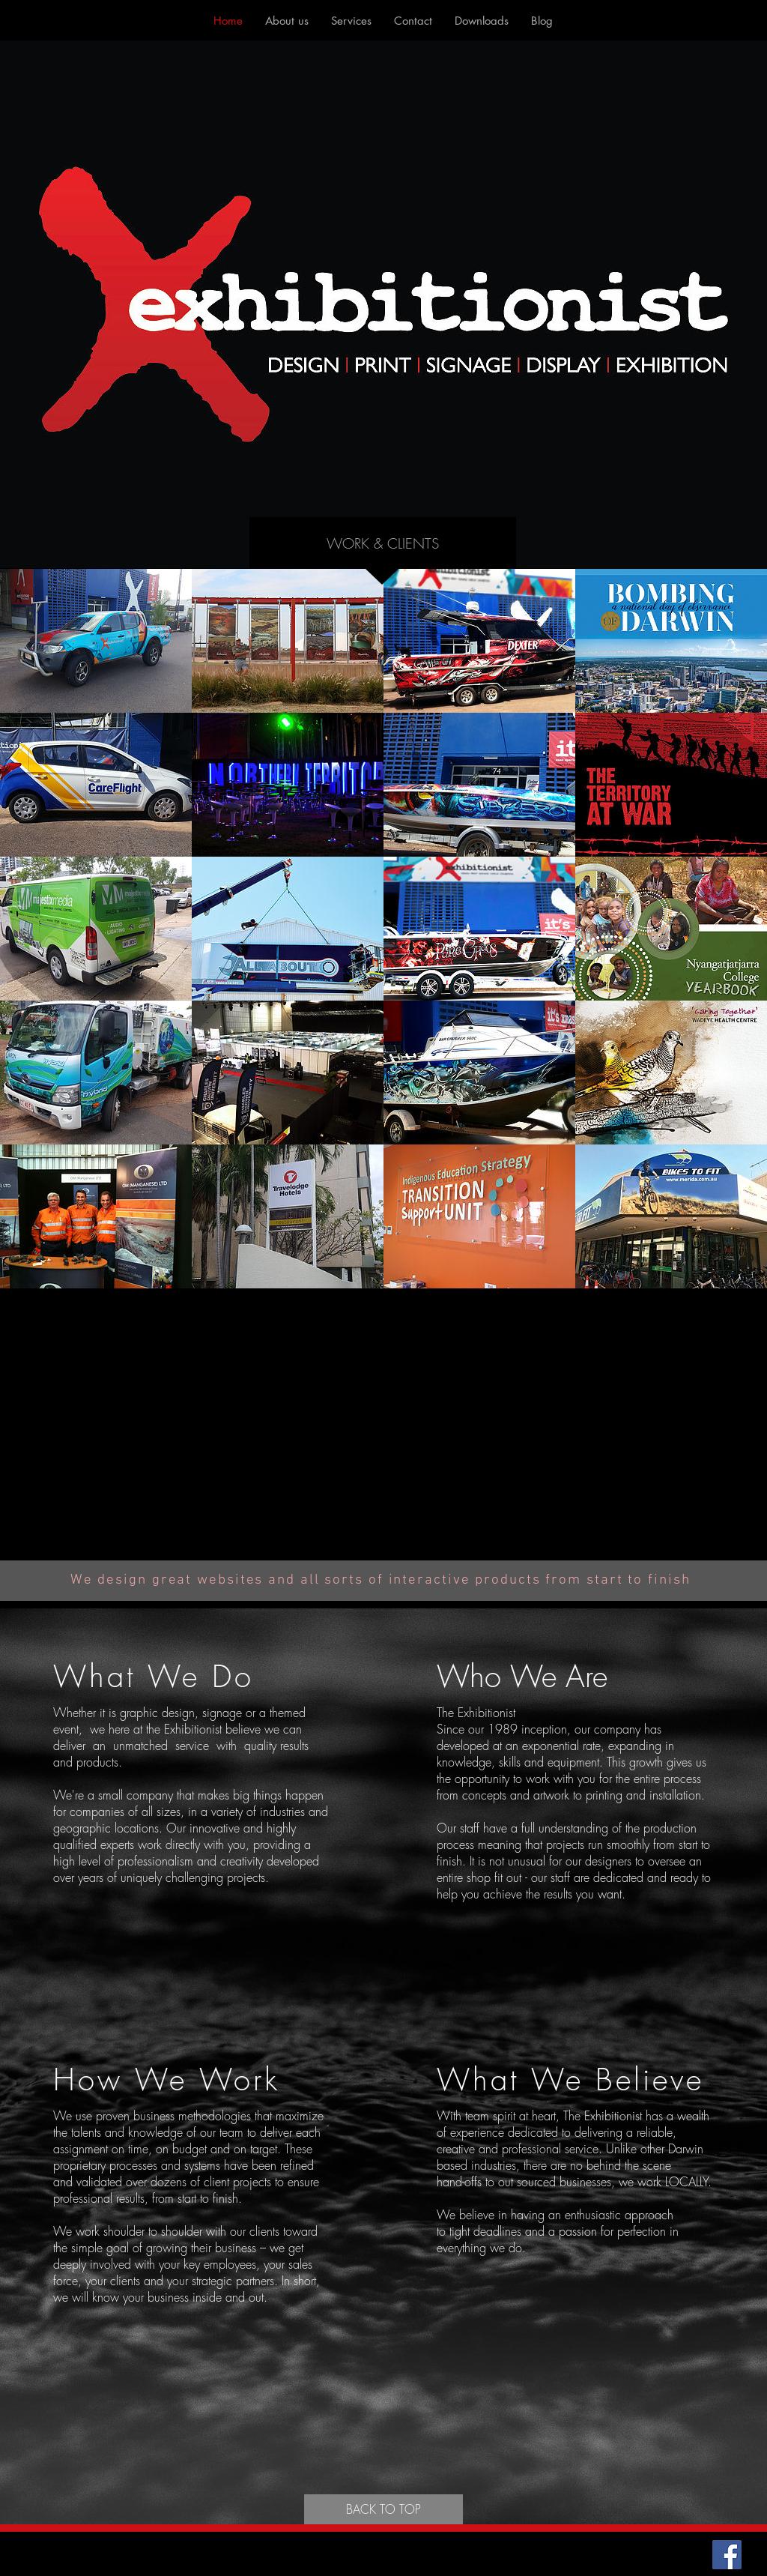 Exhibitionist website